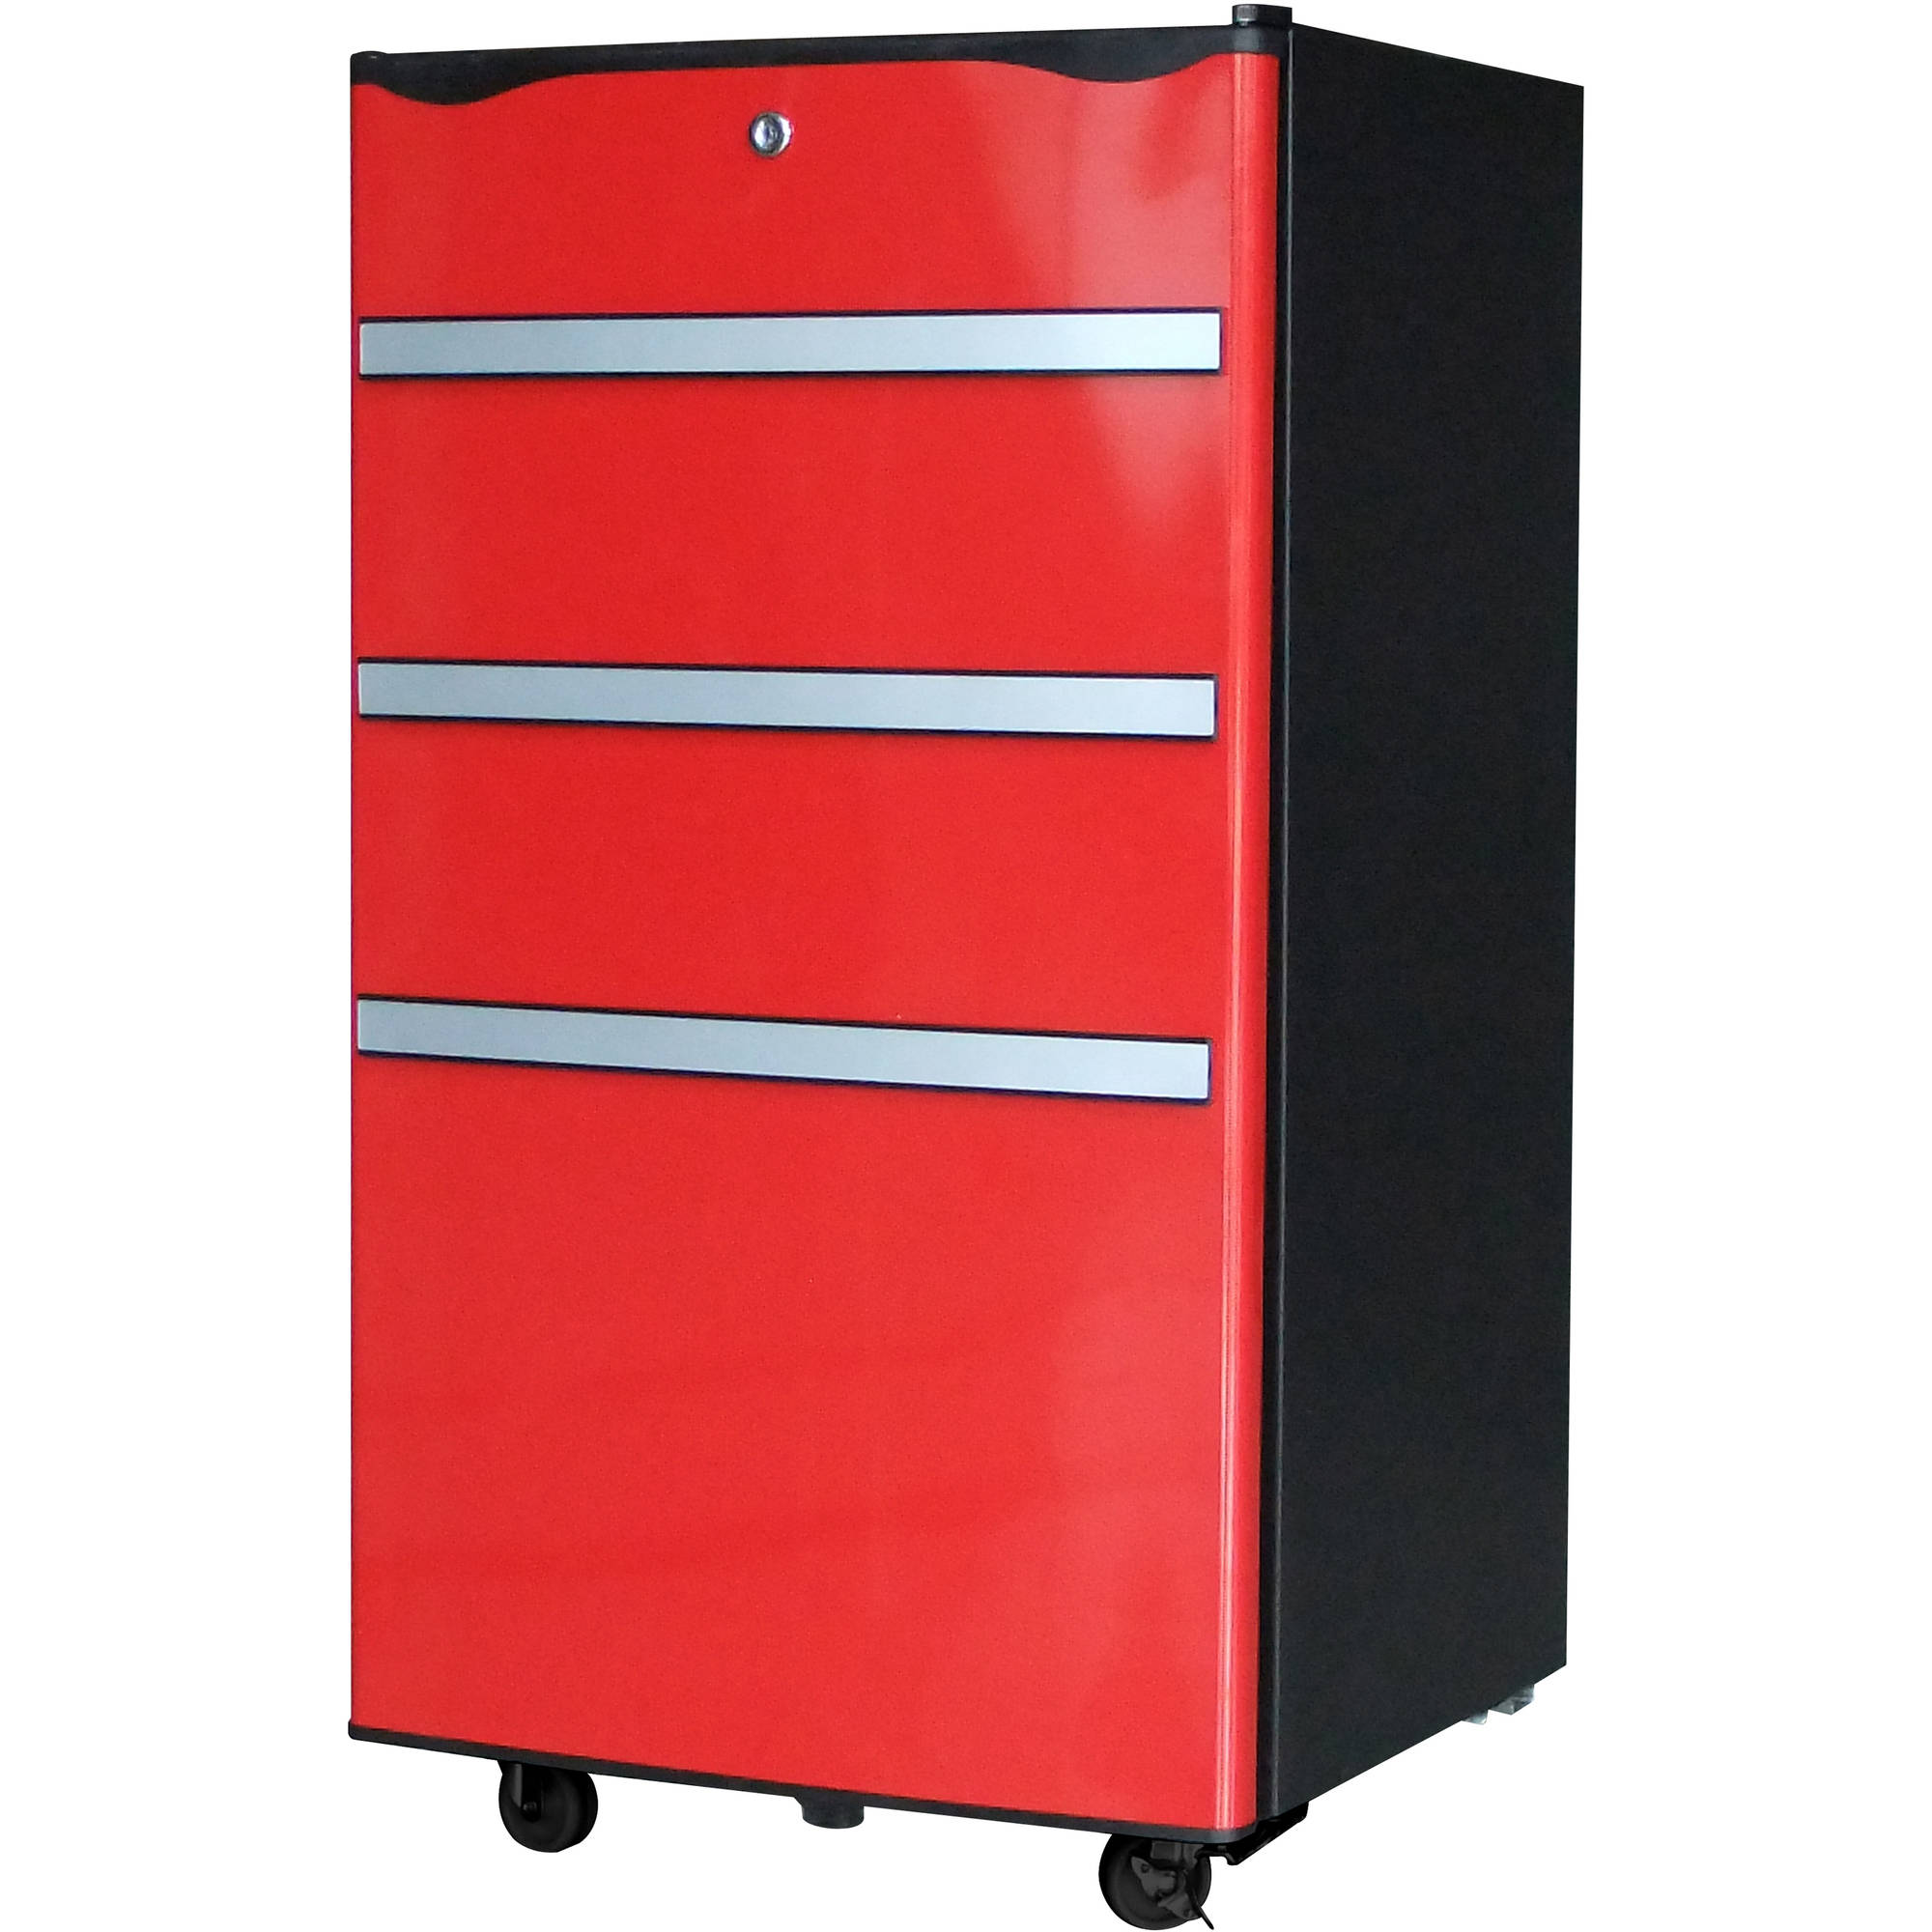 Igloo 3.2 cu ft Garage/Utility Refrigerator, Red